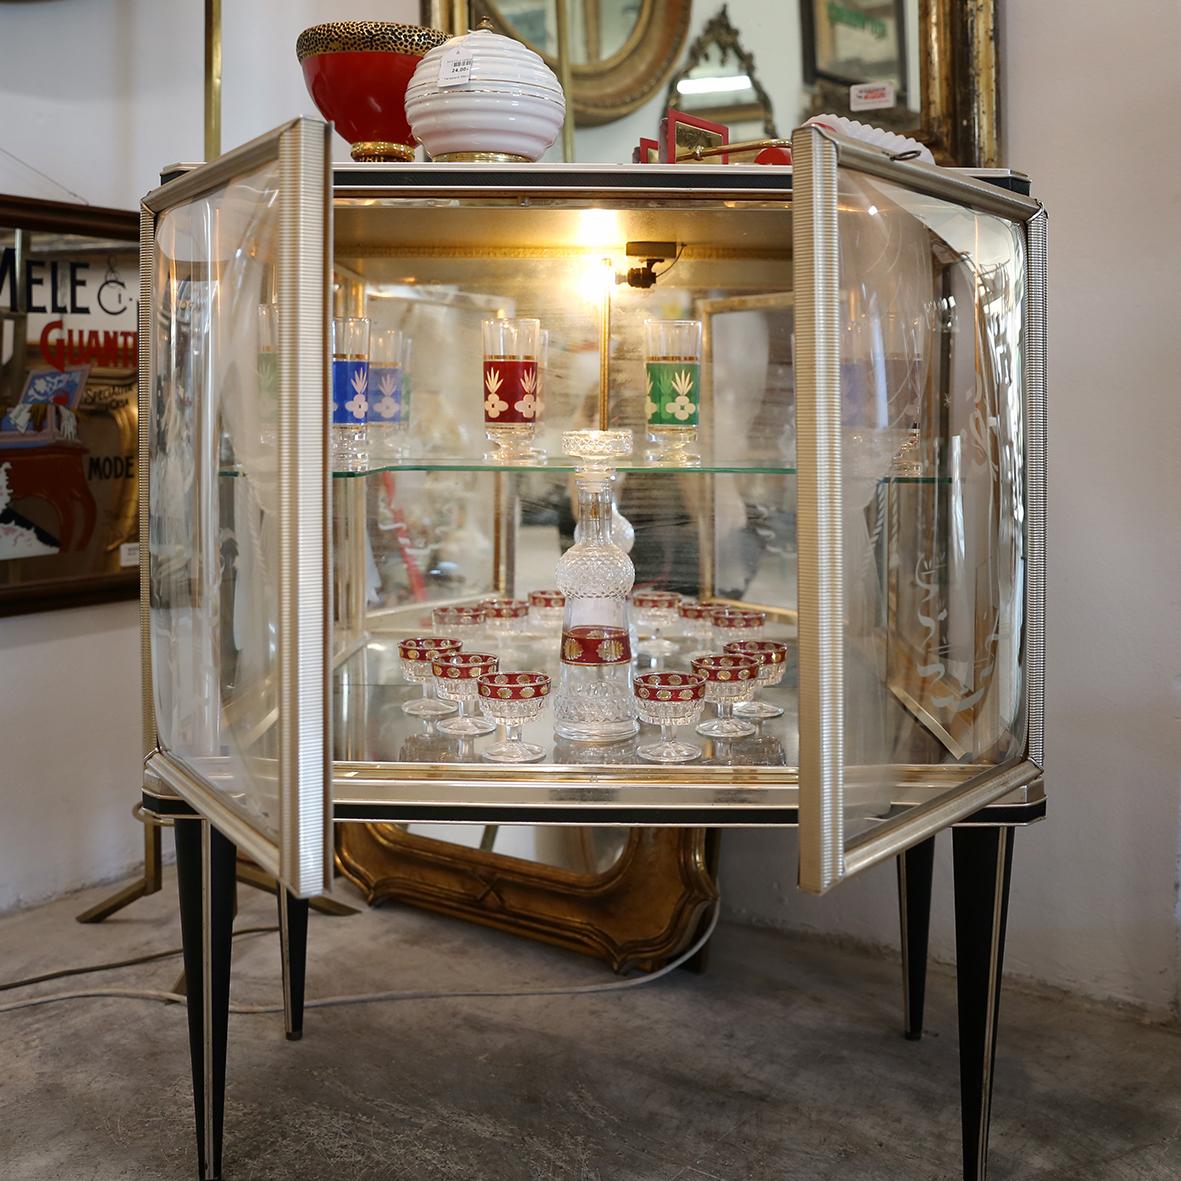 Mobile bar anni 39 50 in vendita da tarabacli a parma - Mobile bar anni 70 ...